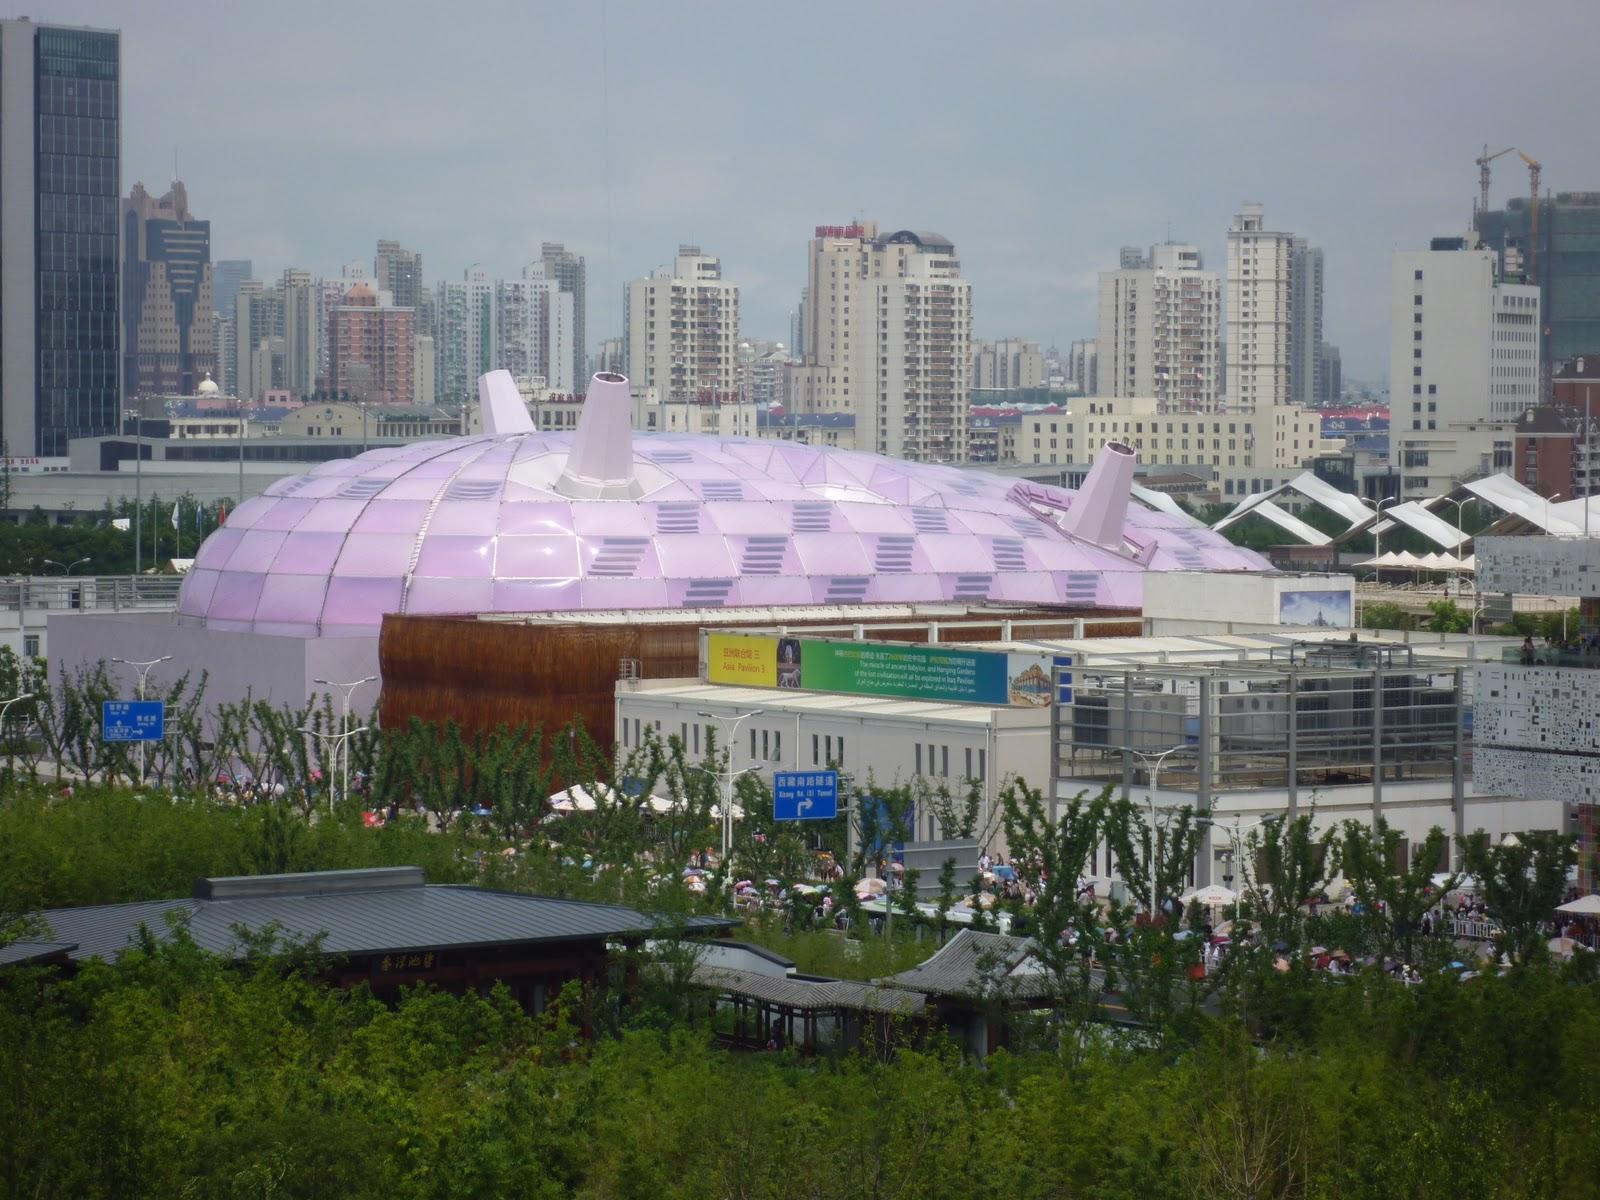 World expo 2010 shanghai china japan pavilion vs japanese for Expo 2010 pavilions